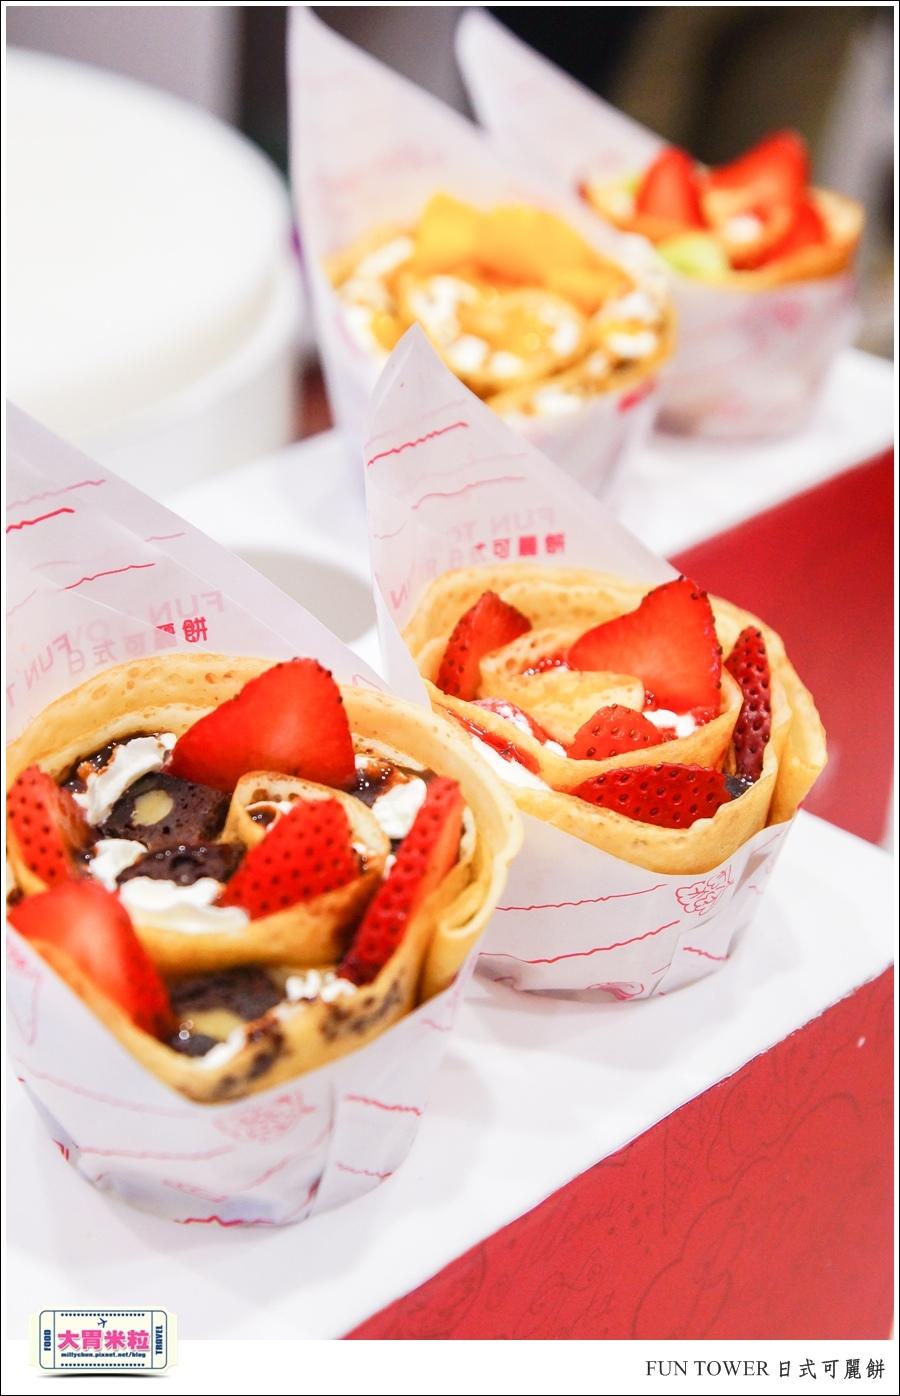 FUN TOWER日式可麗餅(高雄明華店)@高雄可麗餅甜點推薦@大胃米粒0027.jpg